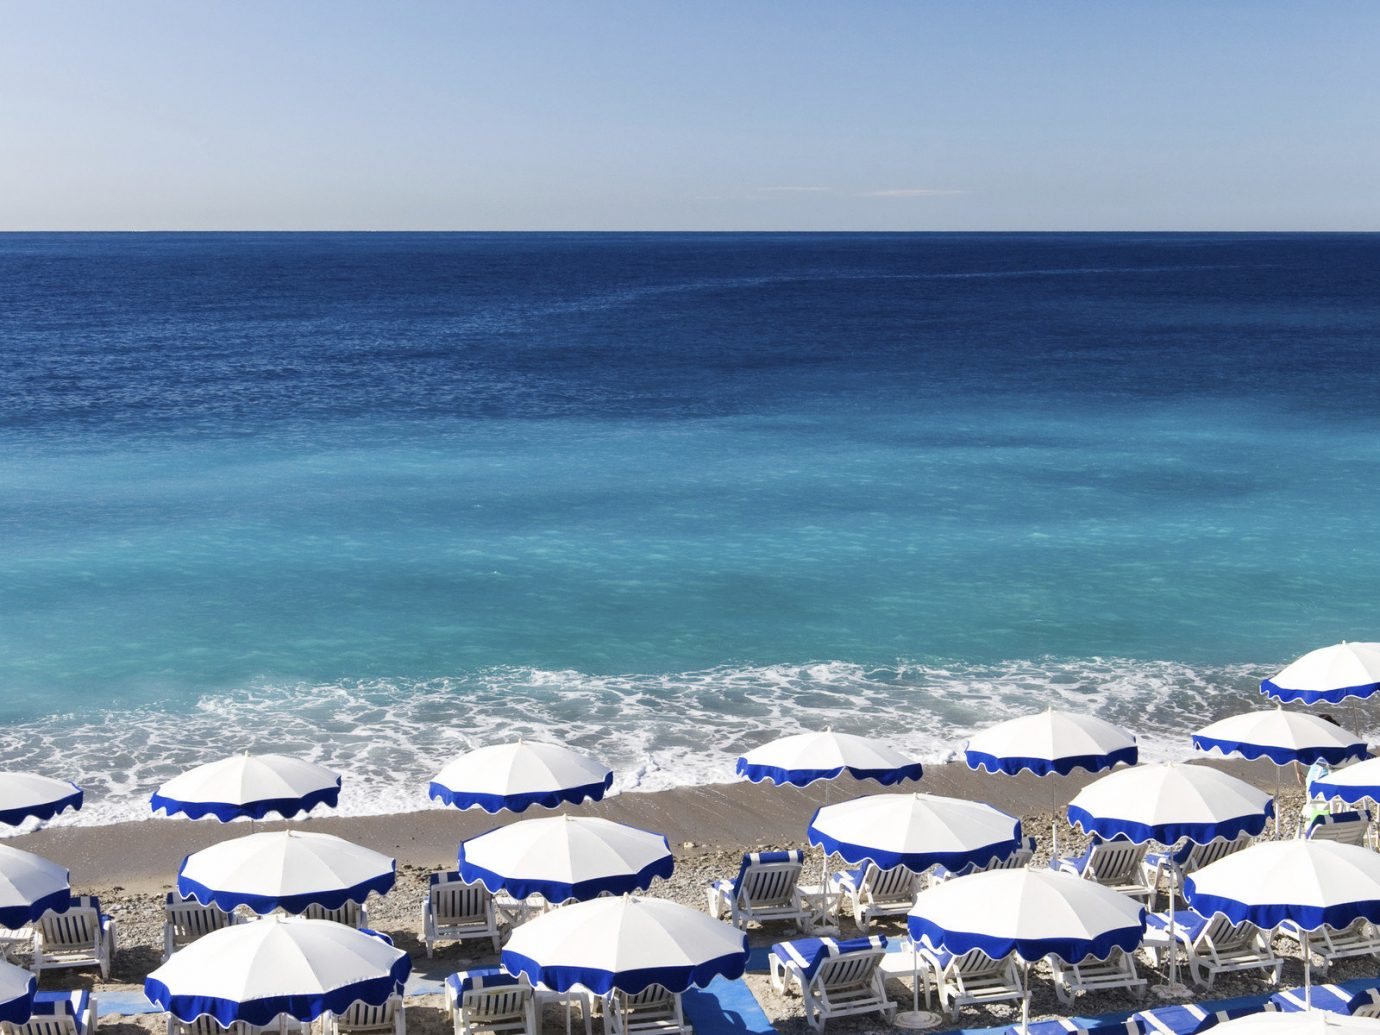 Offbeat Trip Ideas water umbrella sky outdoor Ocean Beach Sea blue body of water shore horizon wind wave wave vacation Coast cape enjoying swimming sandy day